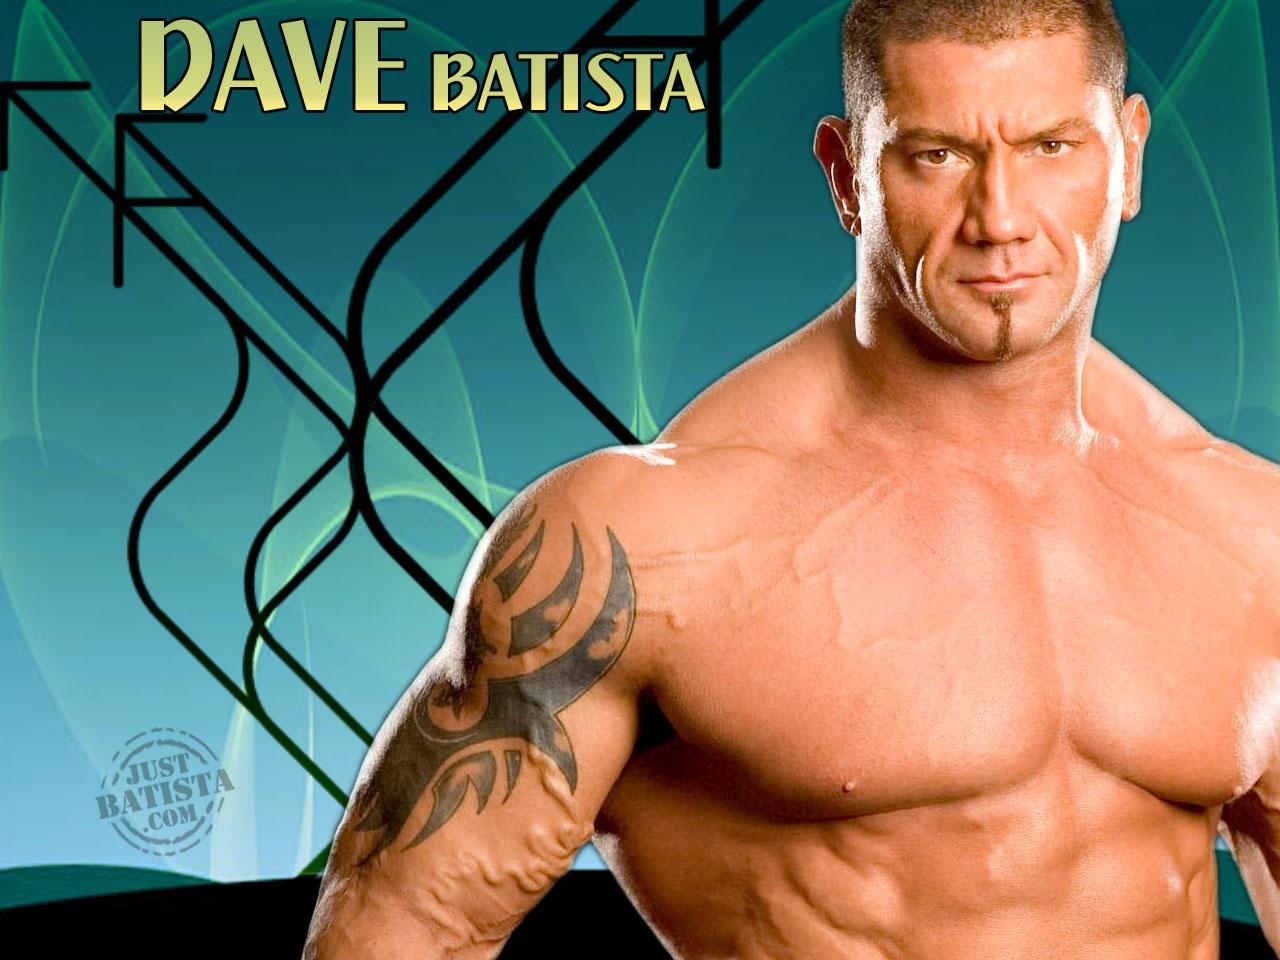 http://1.bp.blogspot.com/-6htoGQiFSgo/ThcIq384AQI/AAAAAAAAAcs/q9ZoxBsMTFY/s1600/Batista-Wallpaper-5.jpg